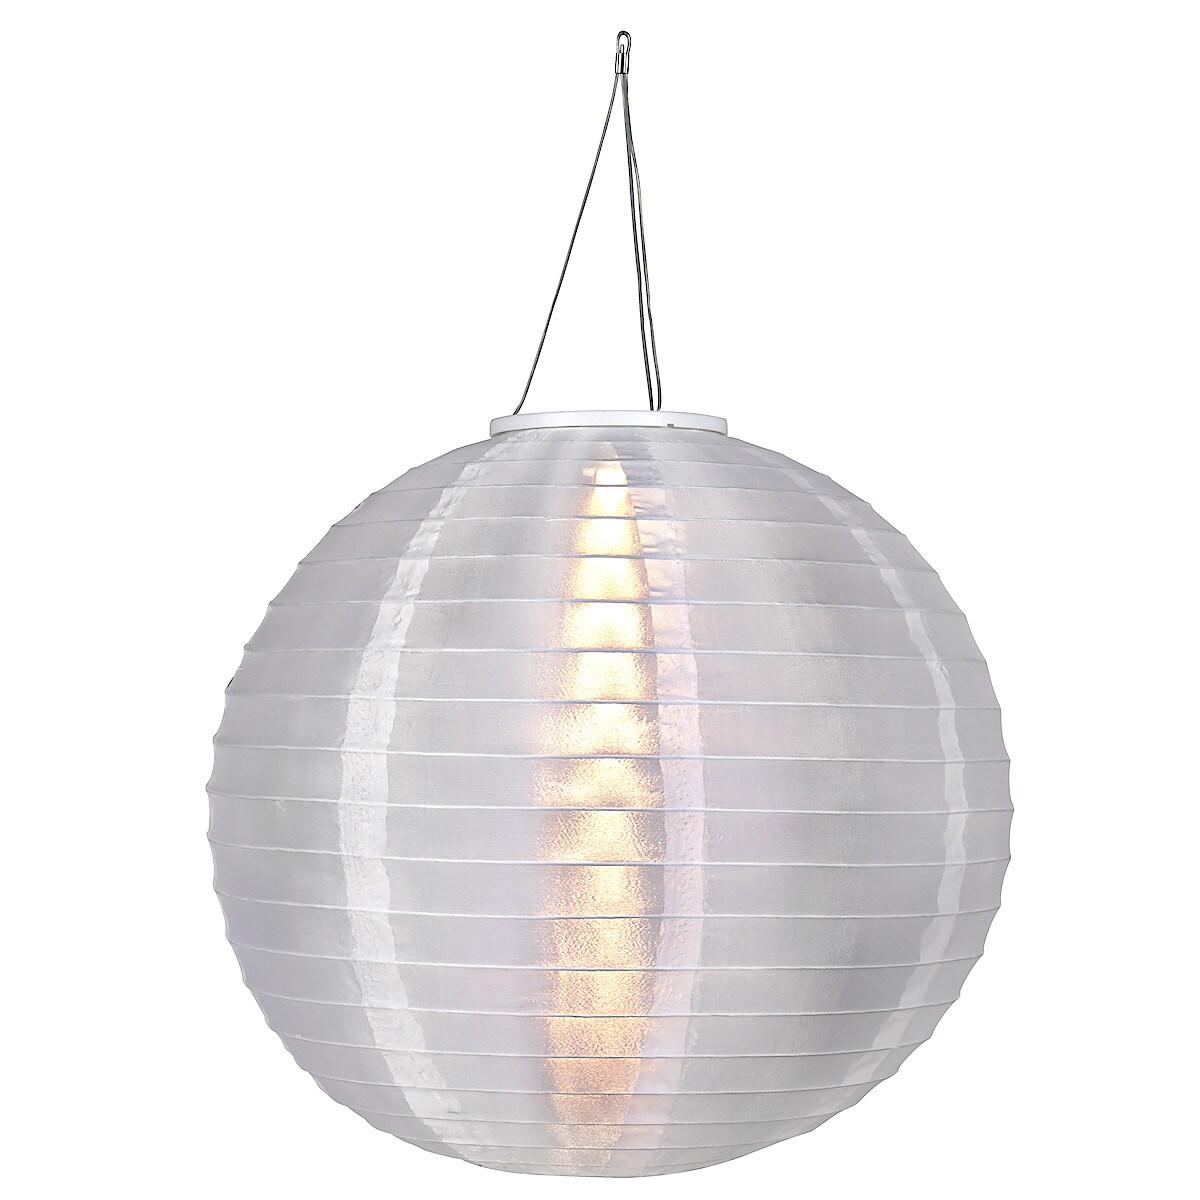 Solcellslampa Ø 20 cm